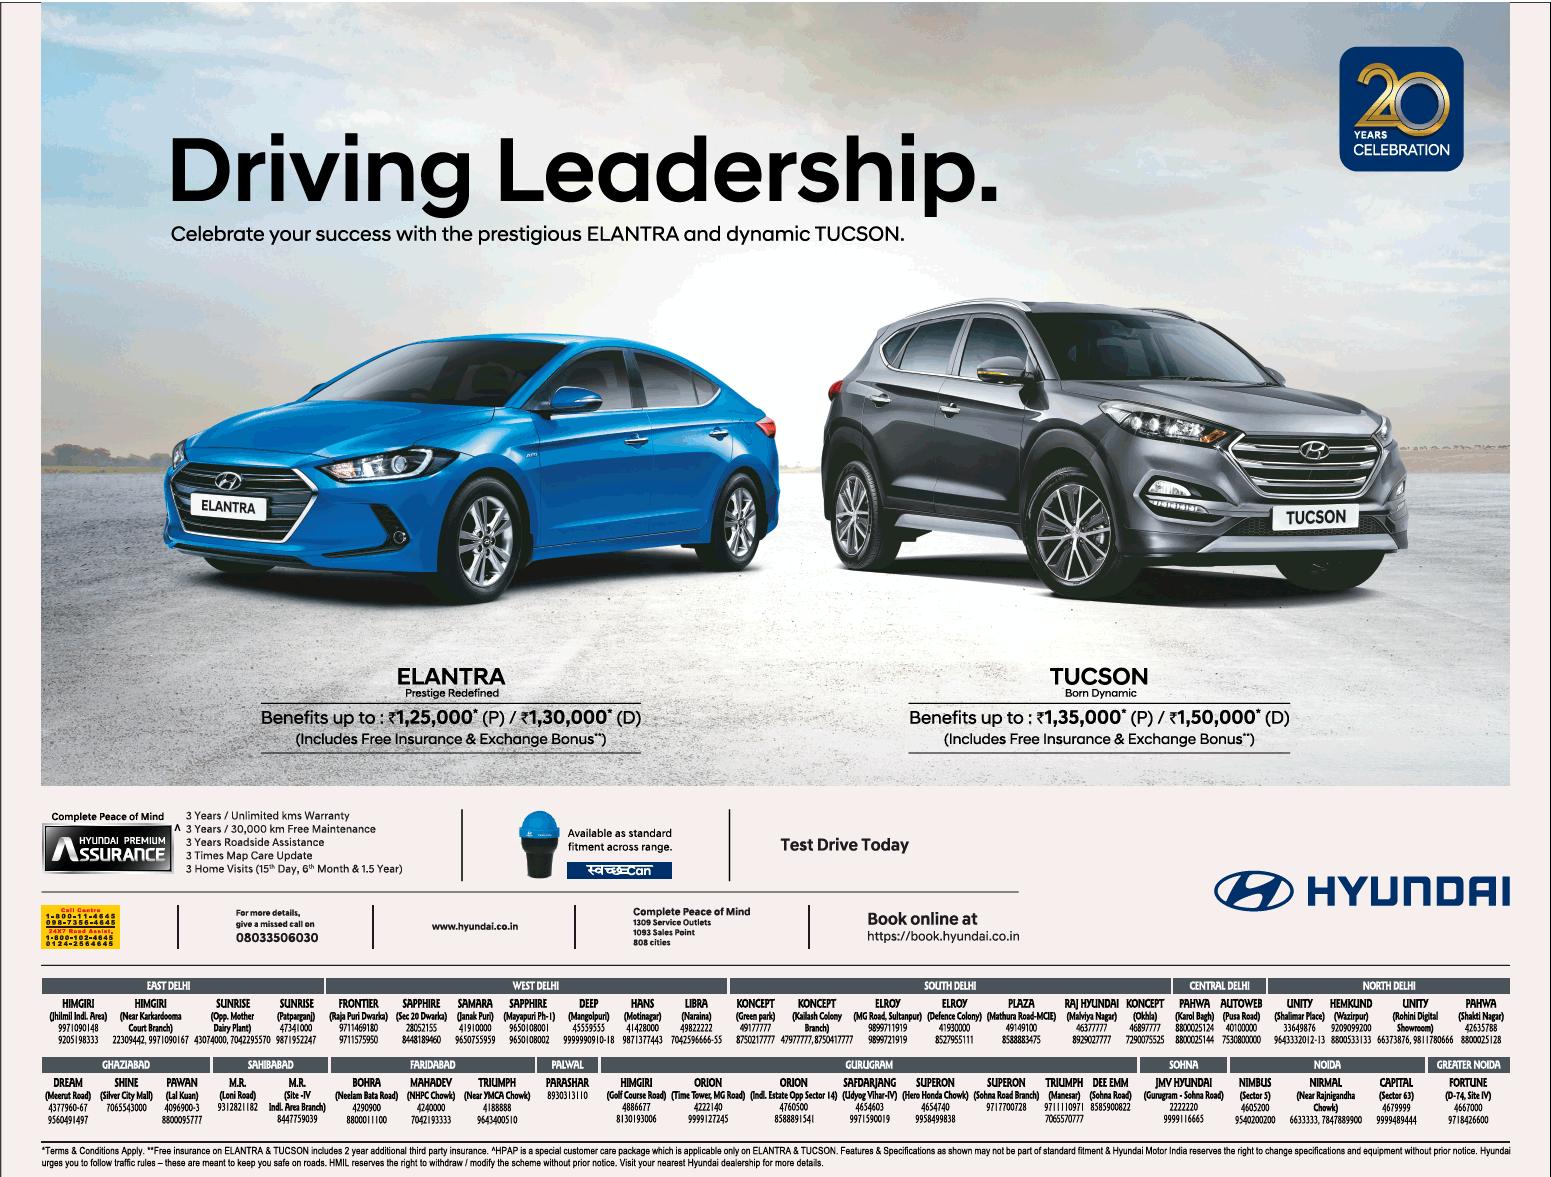 Hyundai 20 Years Celebration Driving Leadership Ad Car Advertising Hyundai Car Ads